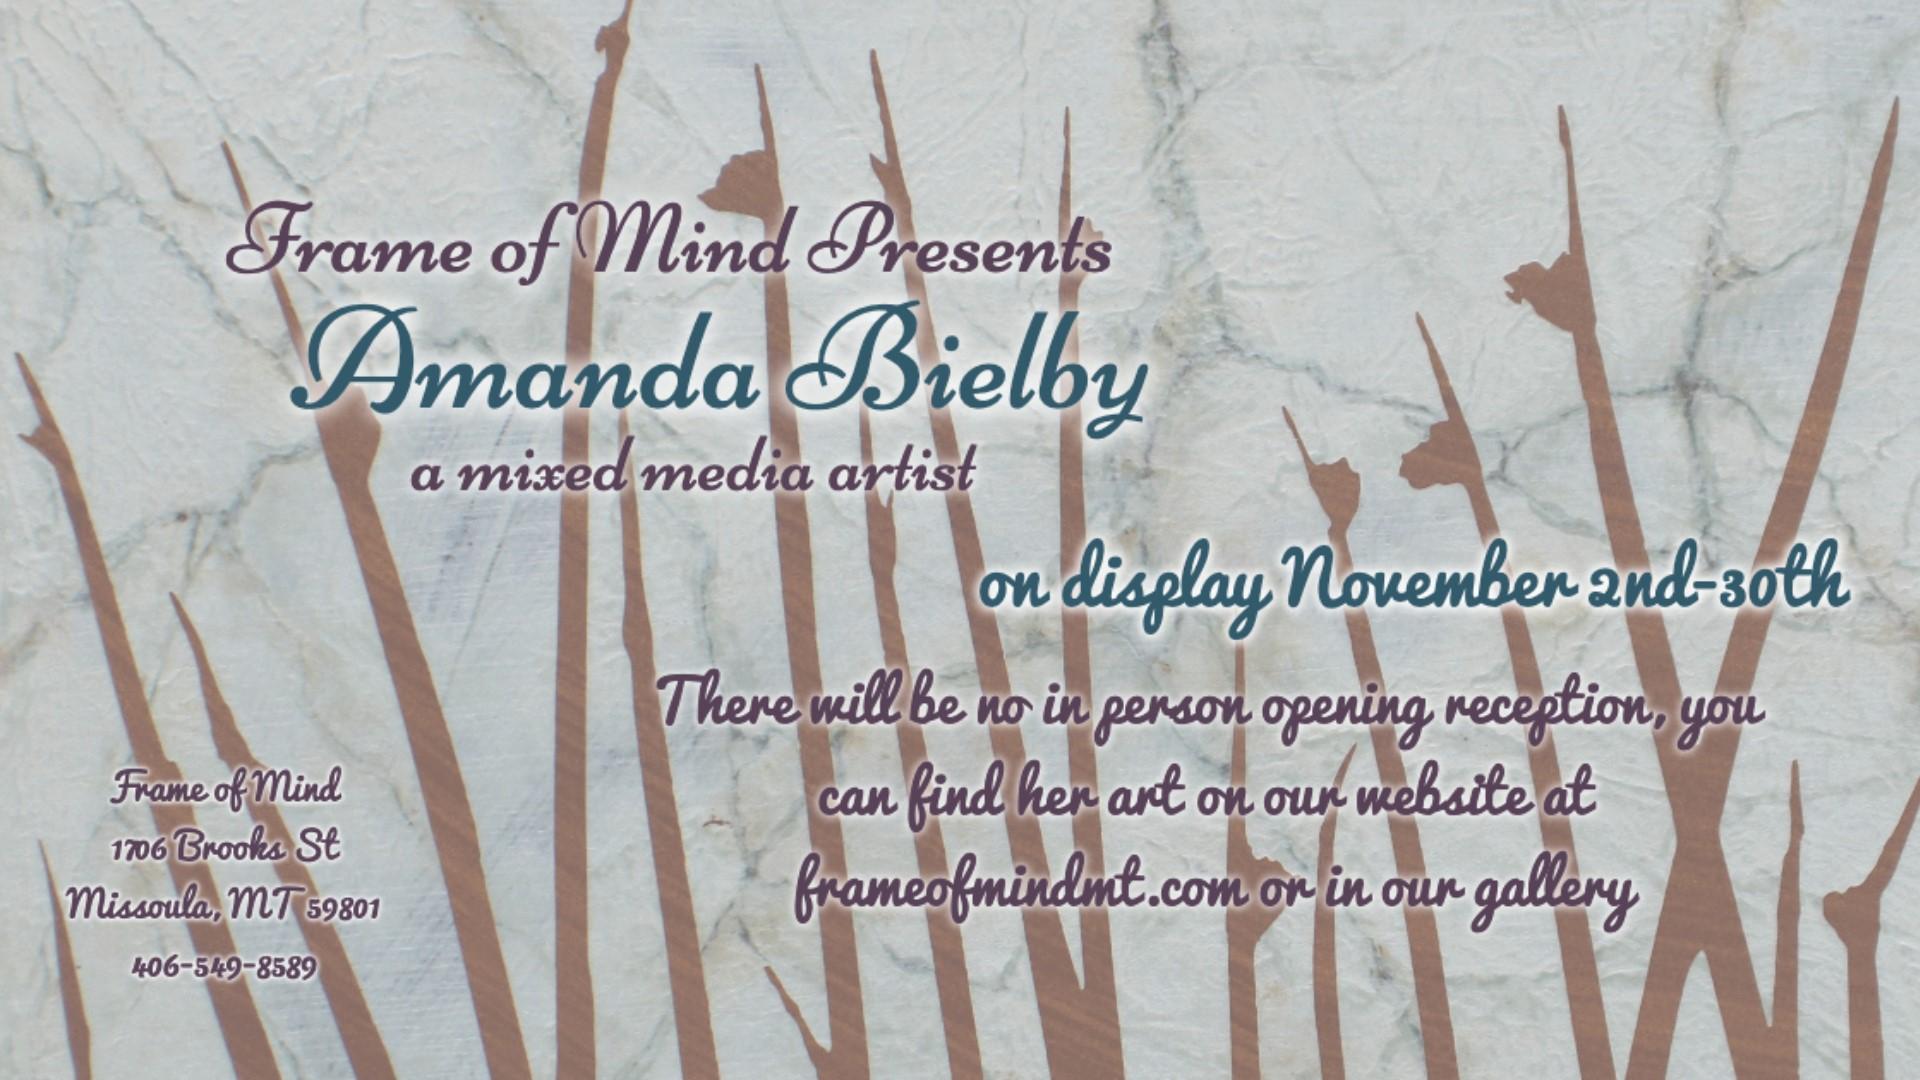 Frame of Mind presents Amanda Bielby